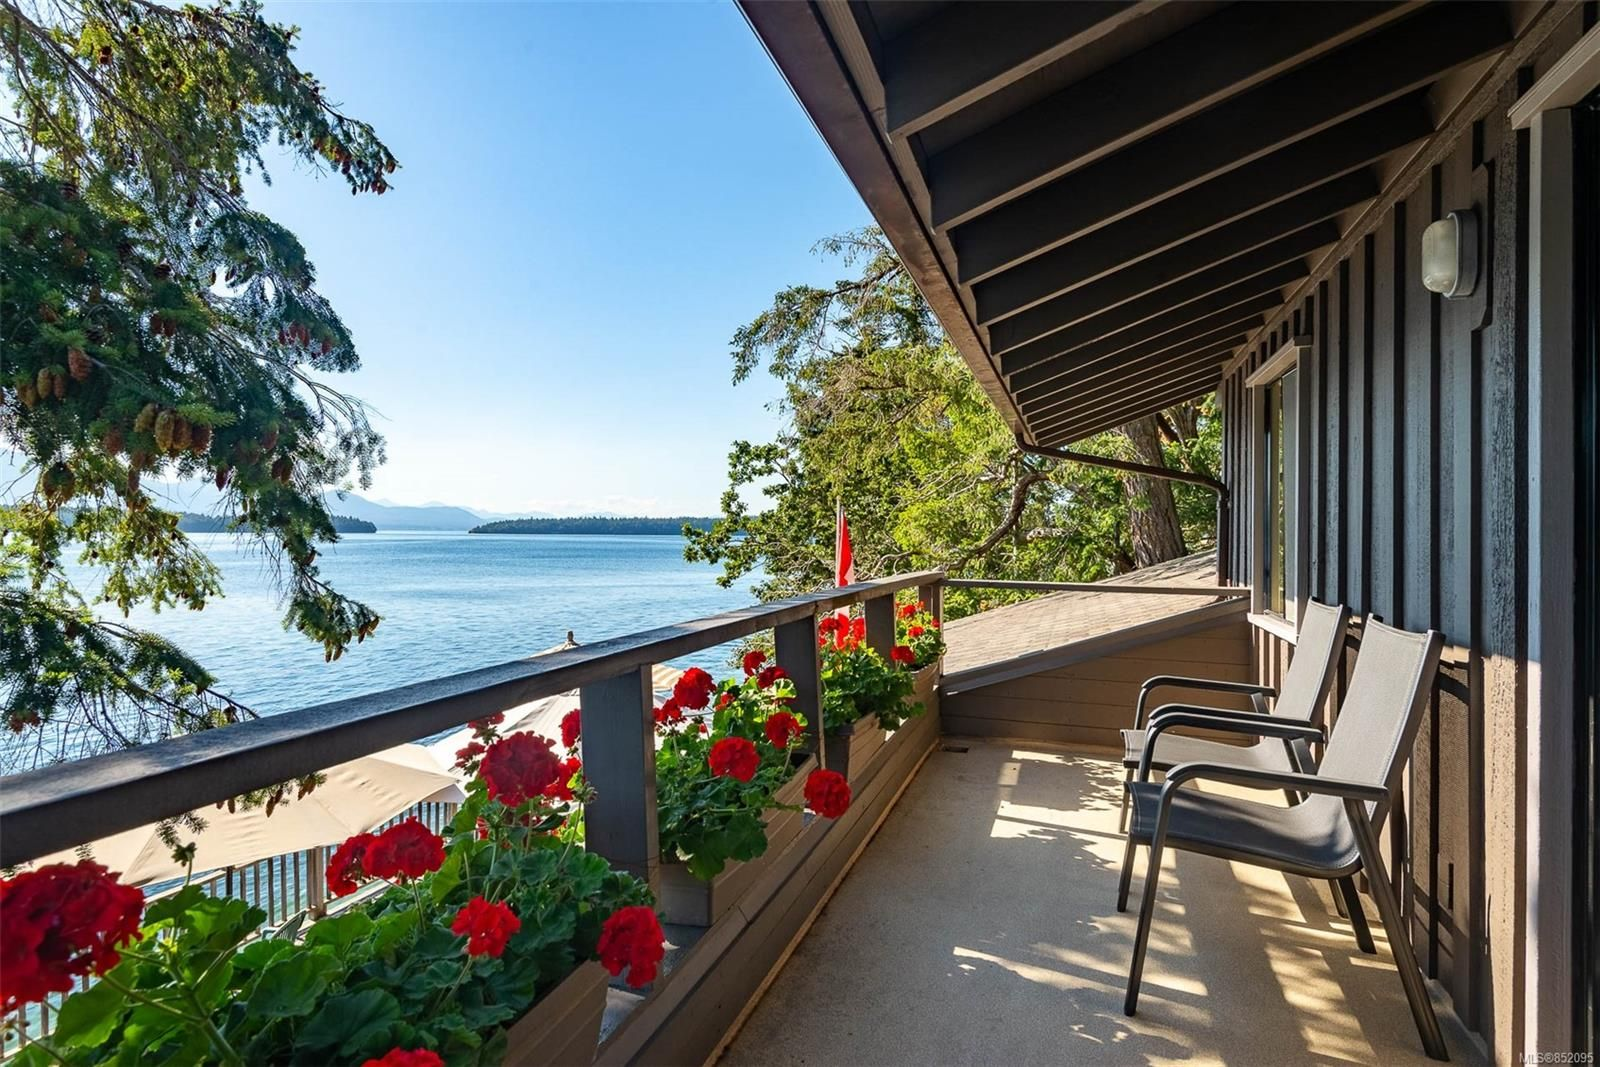 Photo 13: Photos: 236 McGill Rd in : GI Salt Spring House for sale (Gulf Islands)  : MLS®# 852095